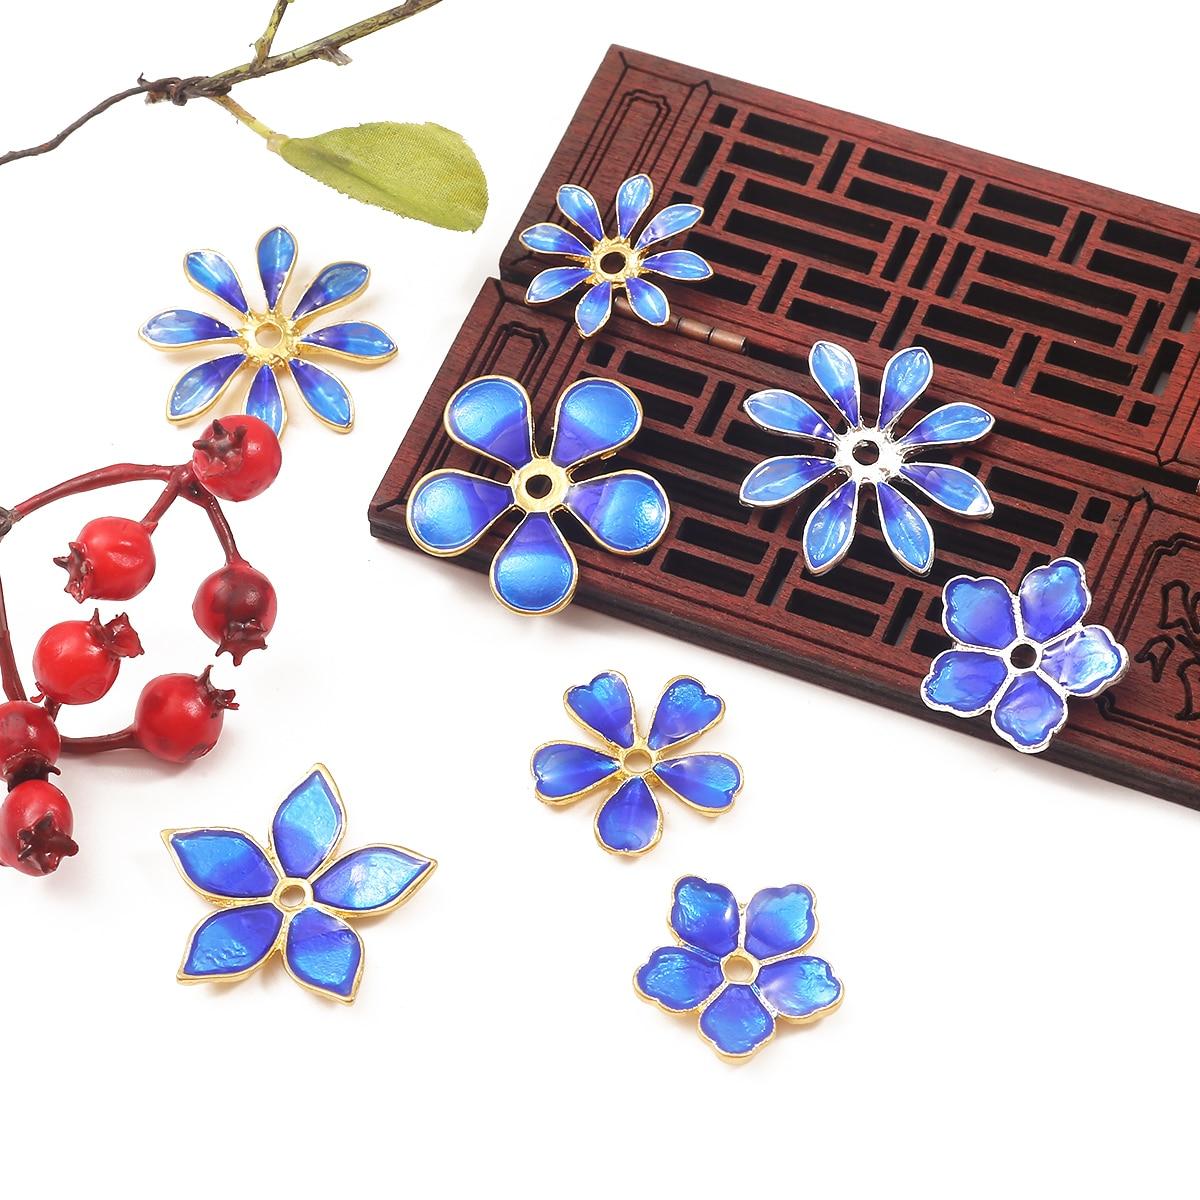 Novo 10 pçs cloisonne flores pulseira contas de liga óleo pintado esmalte brinco colar diy jóias descobertas para presente feminino